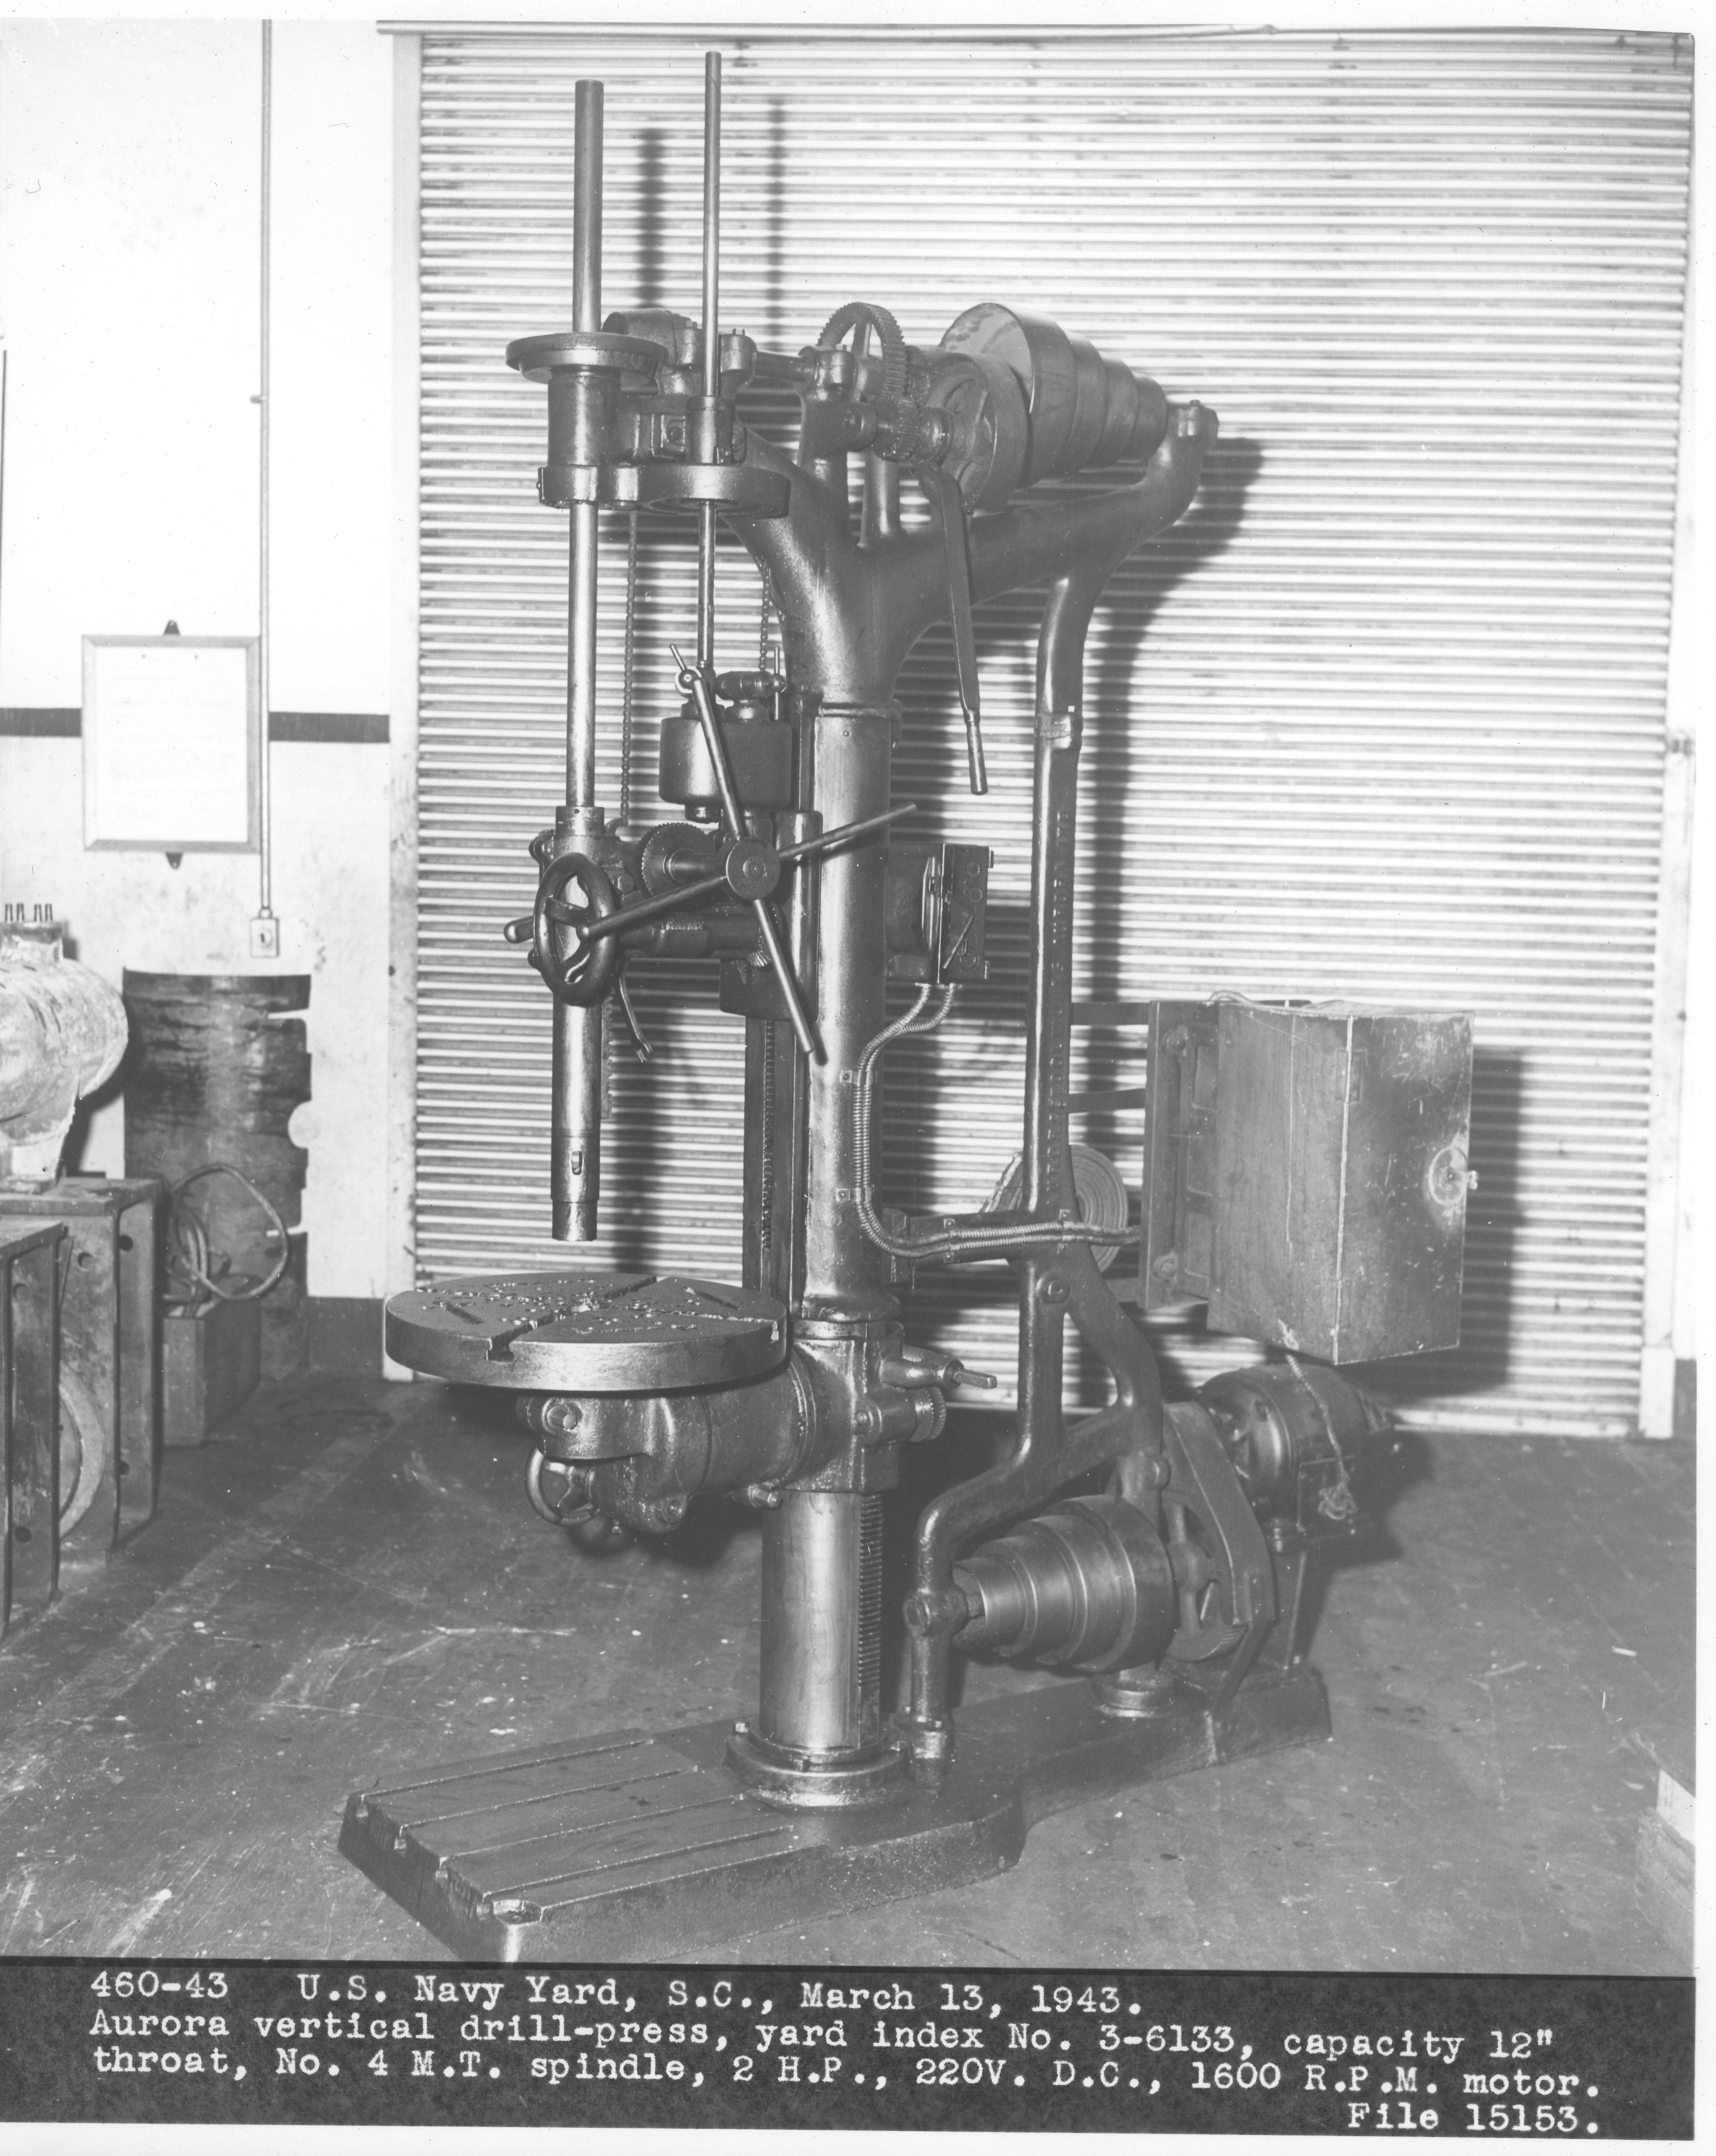 Aurora vertical drill-press